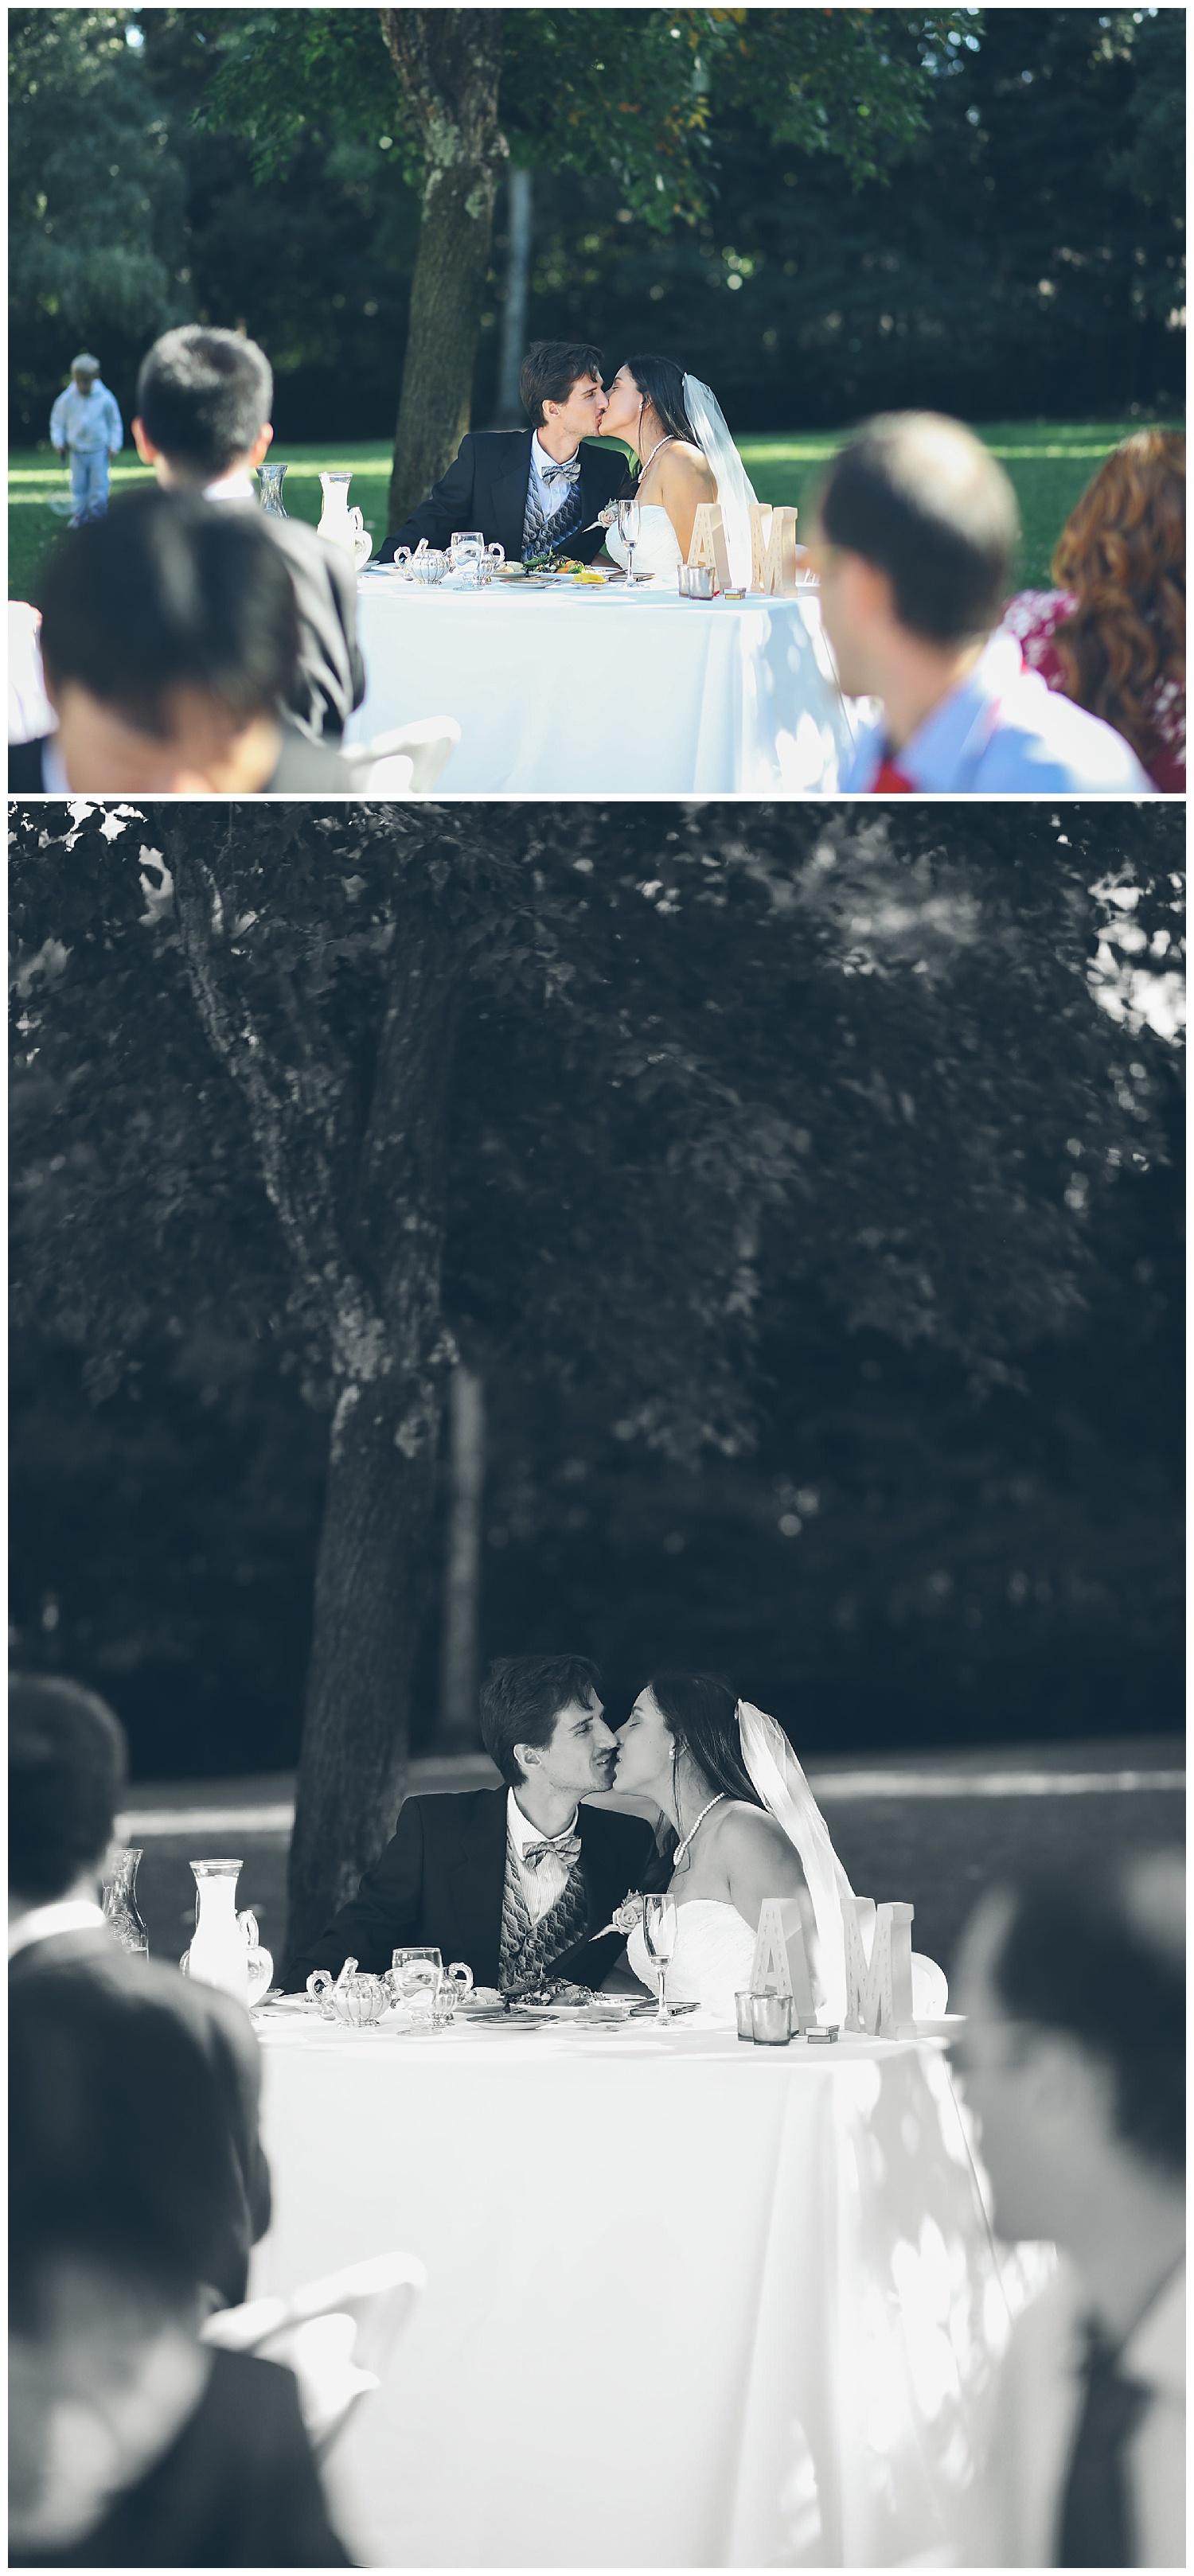 khariza-rae-photography-bay-area-wedding-photographer_0213.jpg